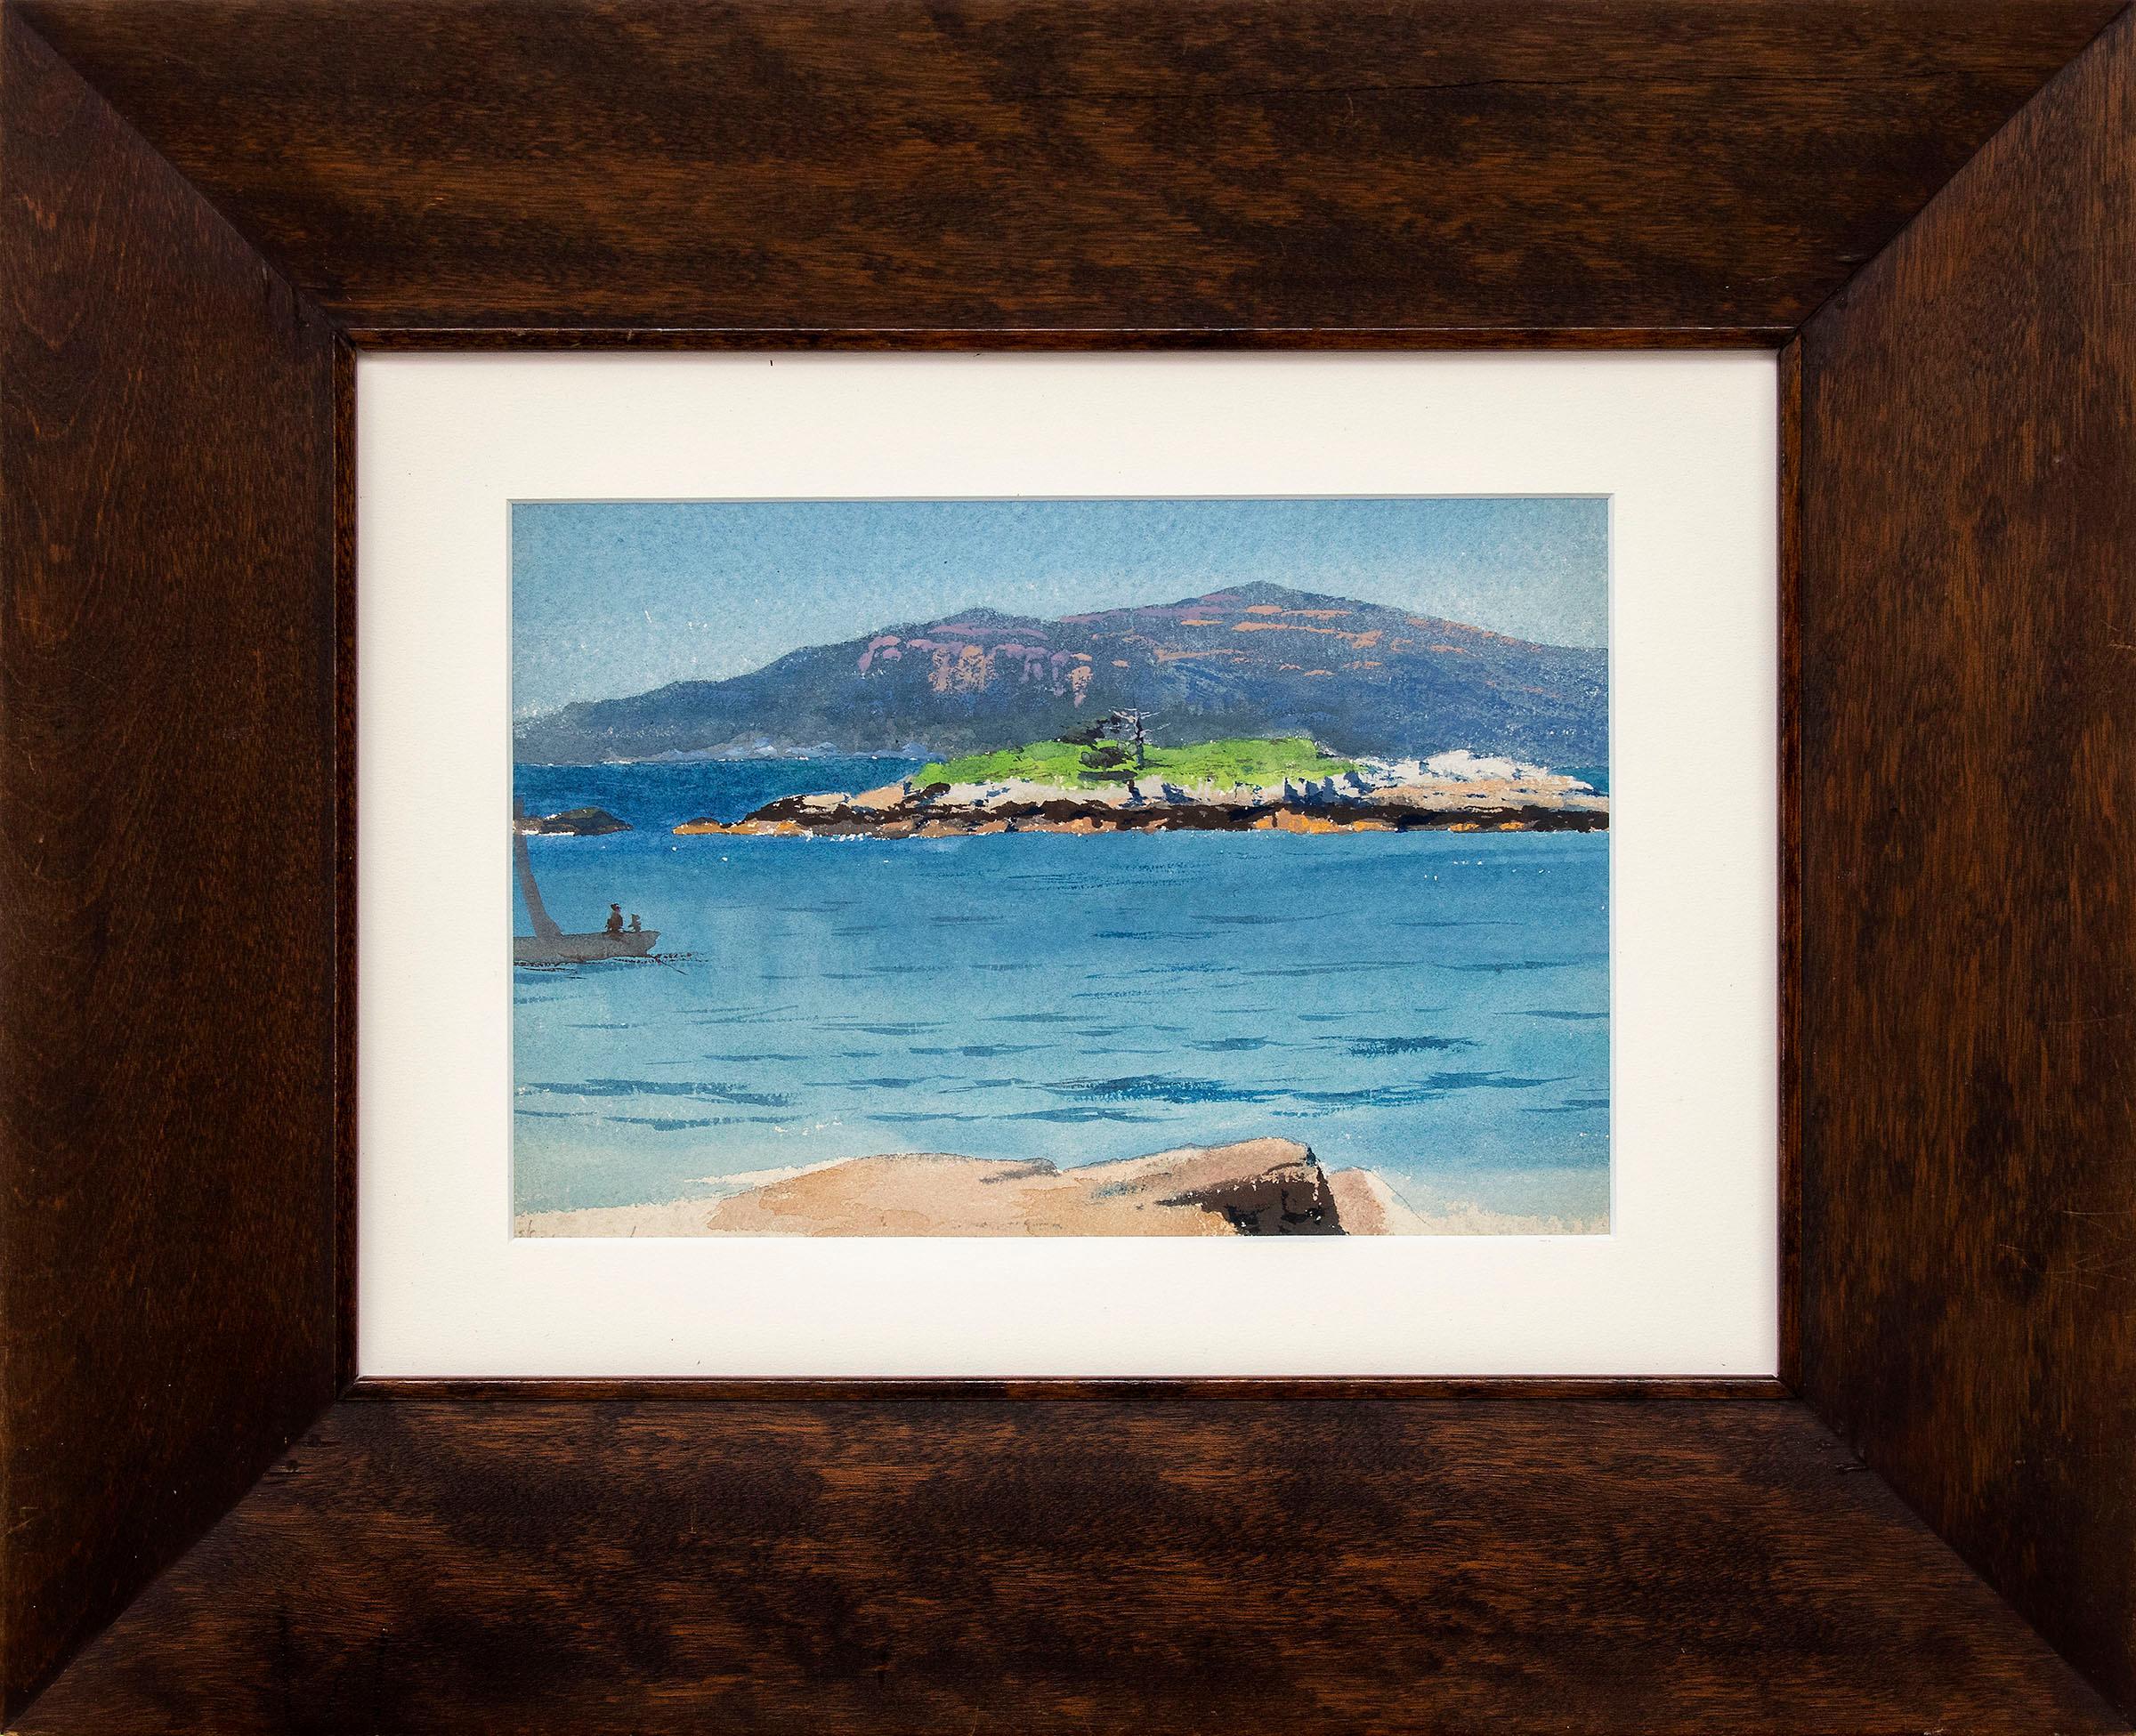 California Coast Landscape Marine Painting, Pacific Ocean, Rocks, Hills